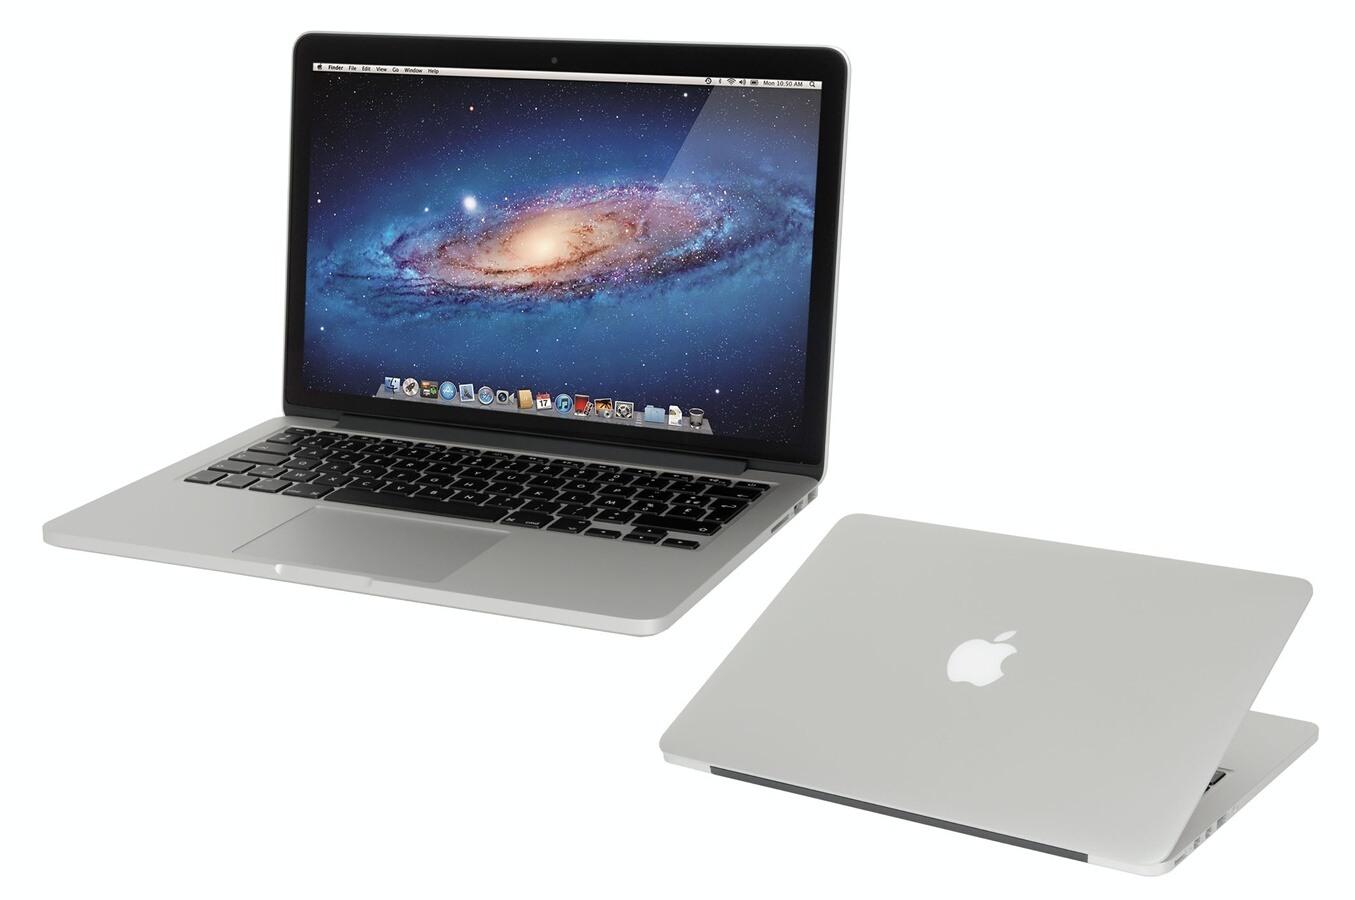 apple_macbook_pro_retina_13_2_6ghz_k1302